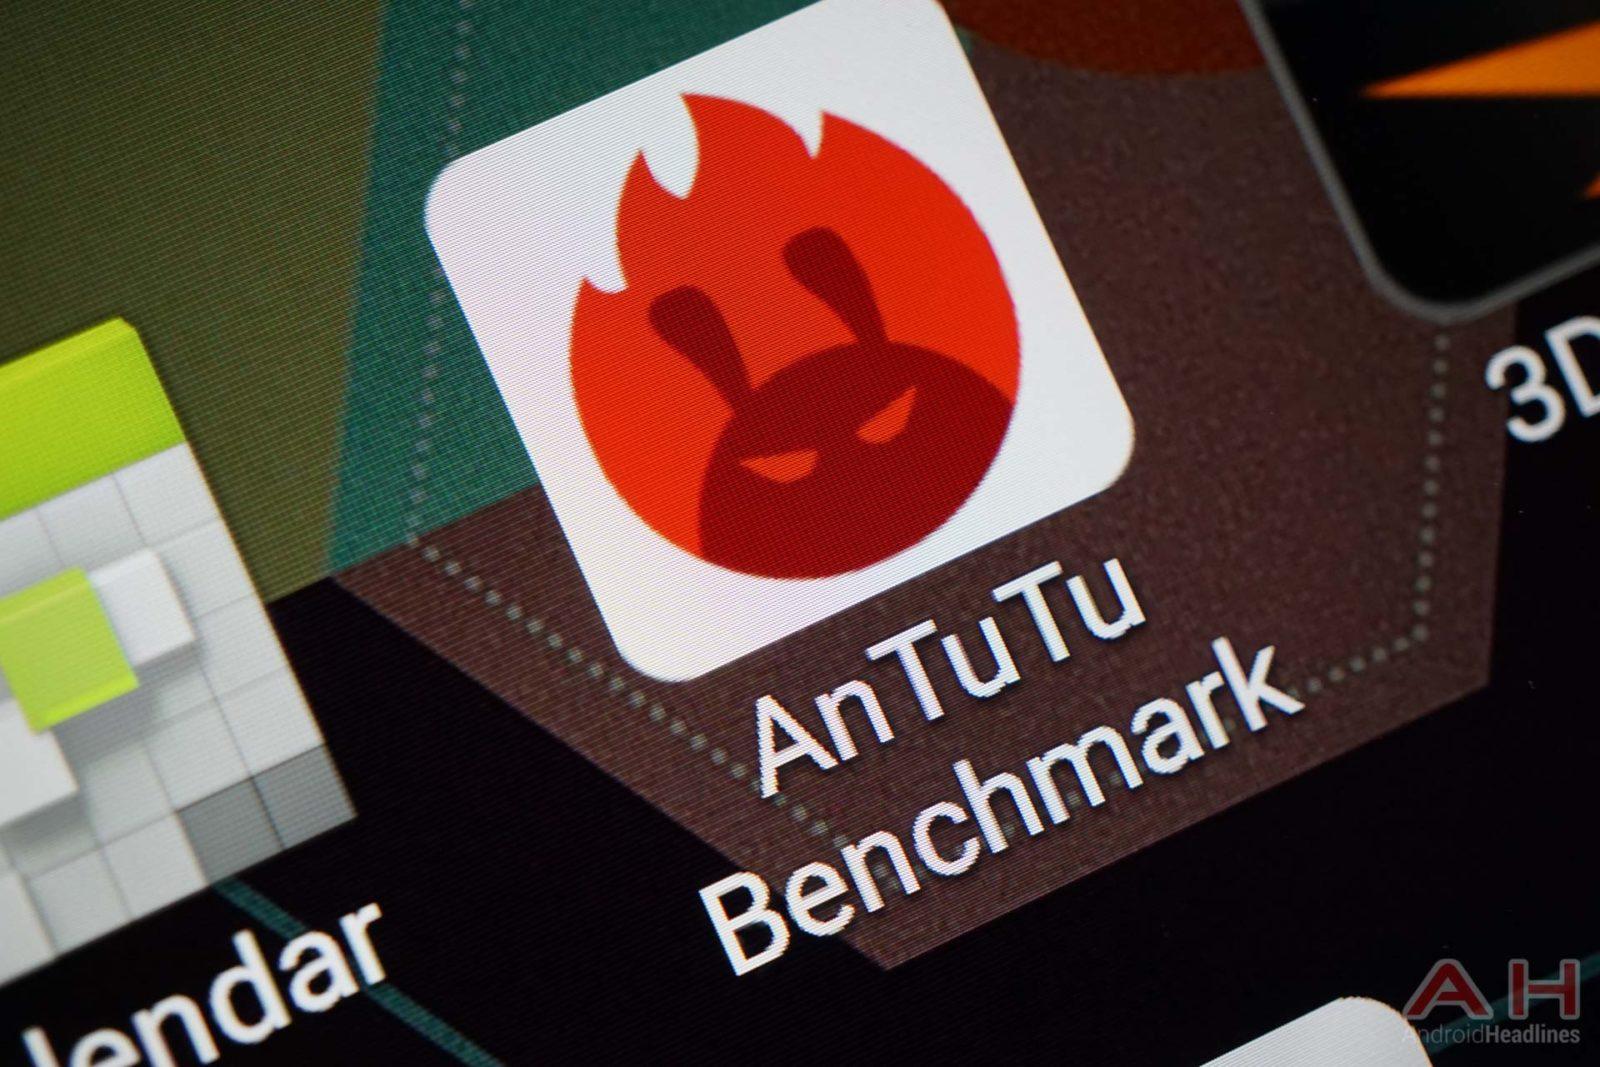 AnTuTu-Benchmark-AM-AH-1-1600x1067 قدرتمندترین گوشیهای دنیا مشخص شدند